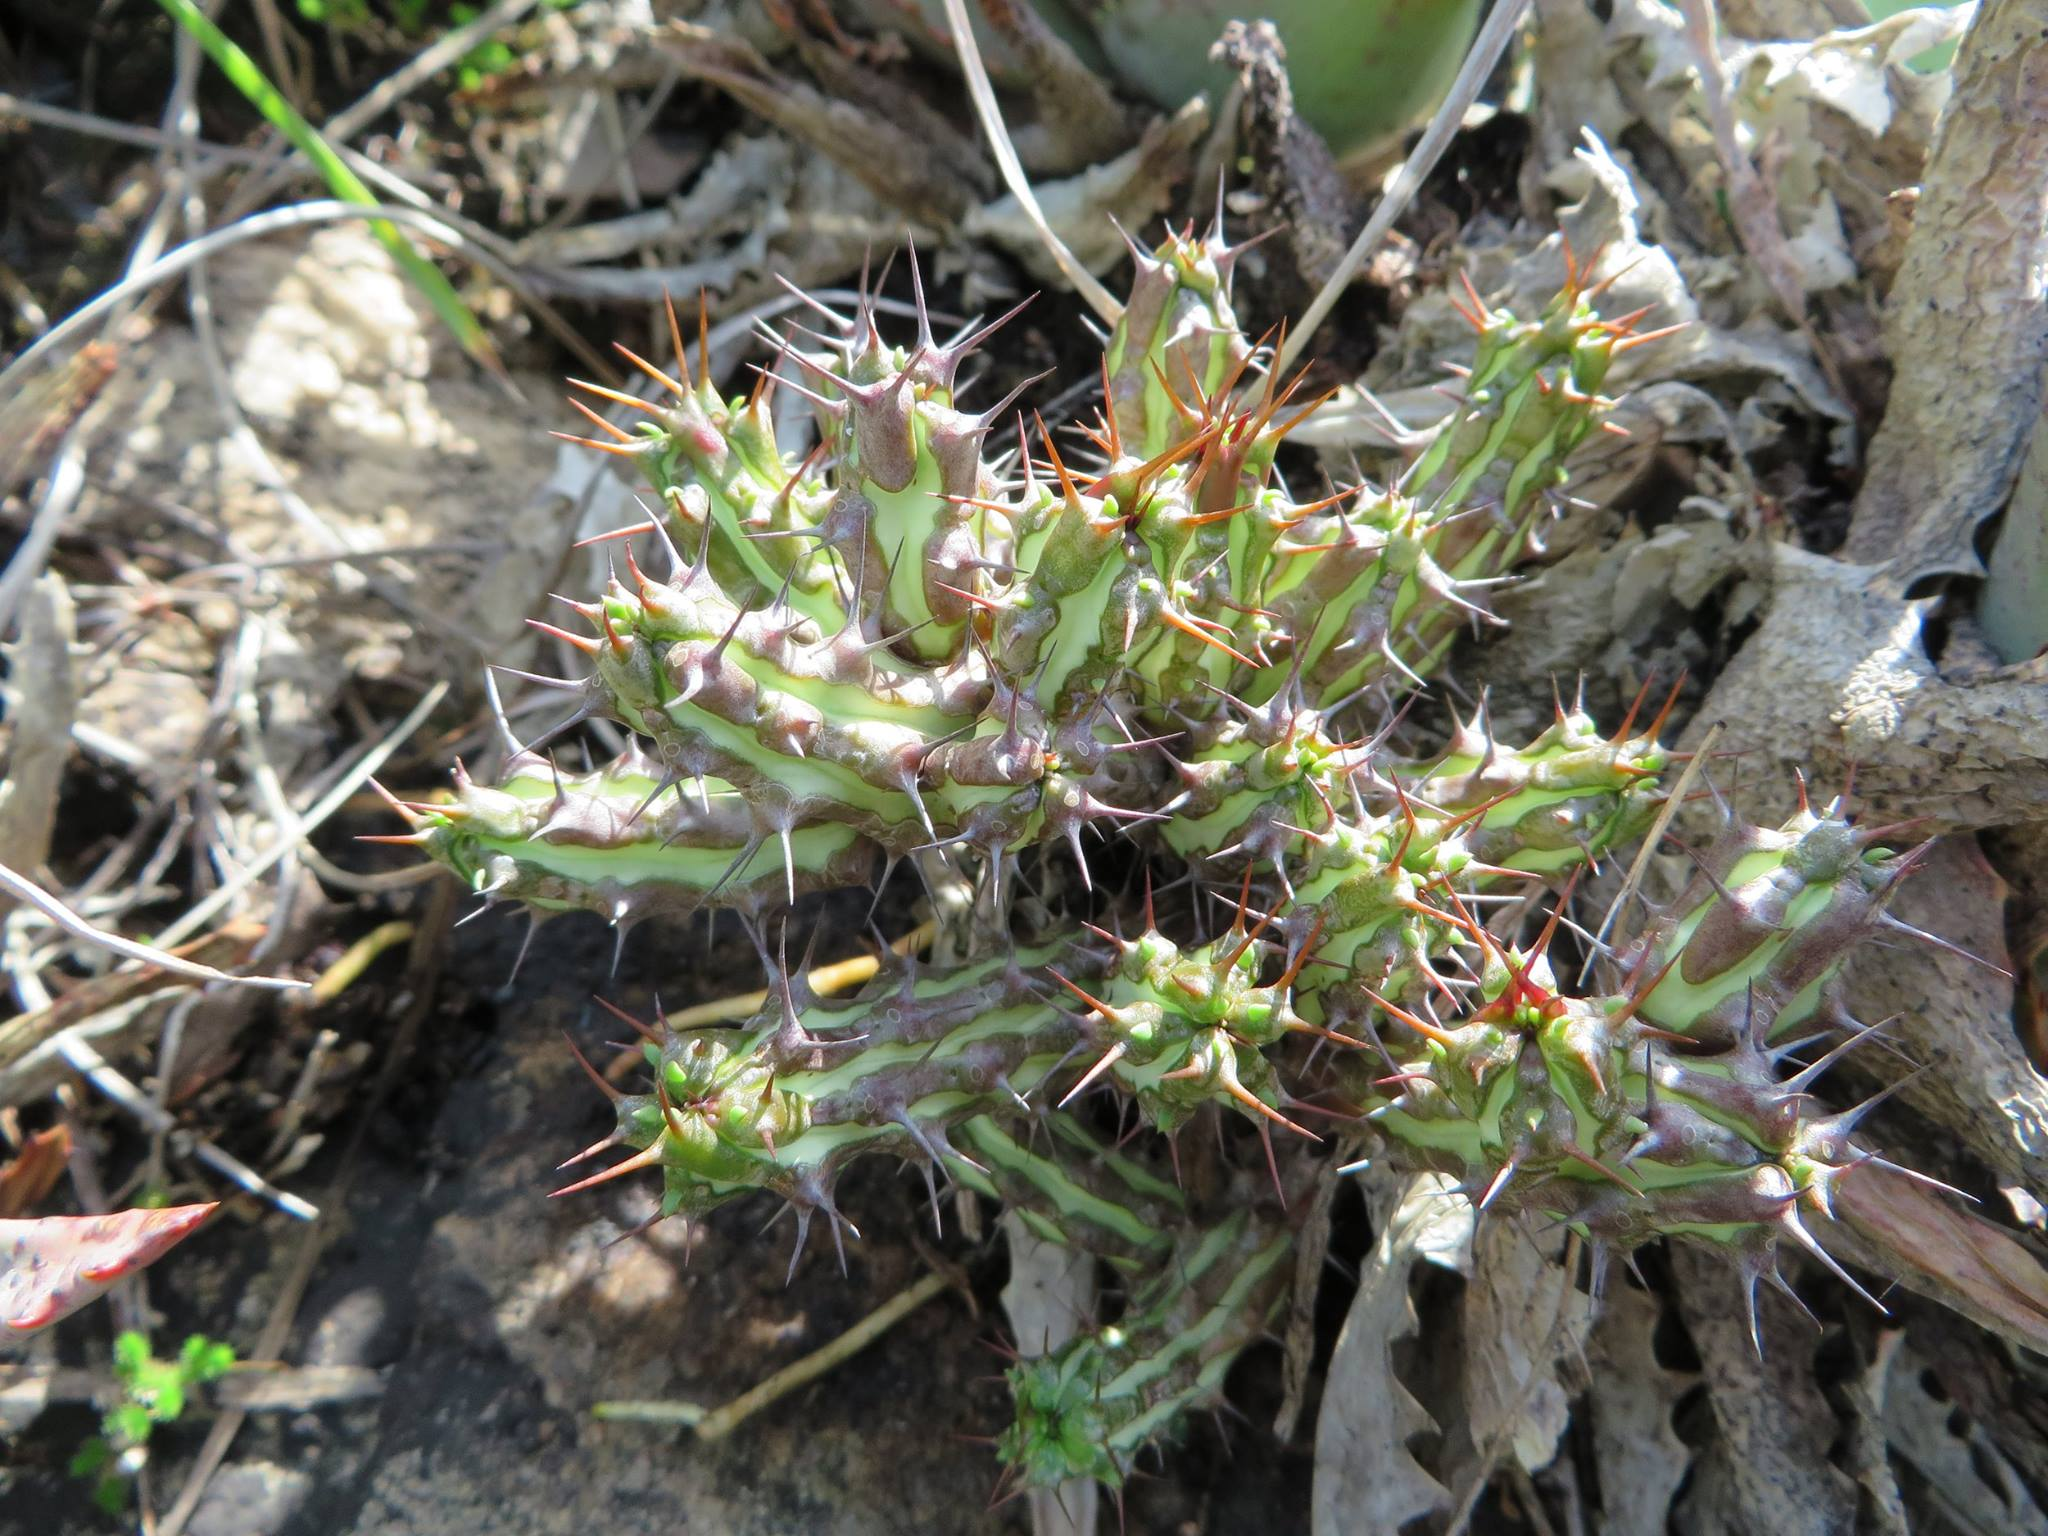 Euphorbia sp, from Montepuez, Cabo delgado province, northern Mozambique